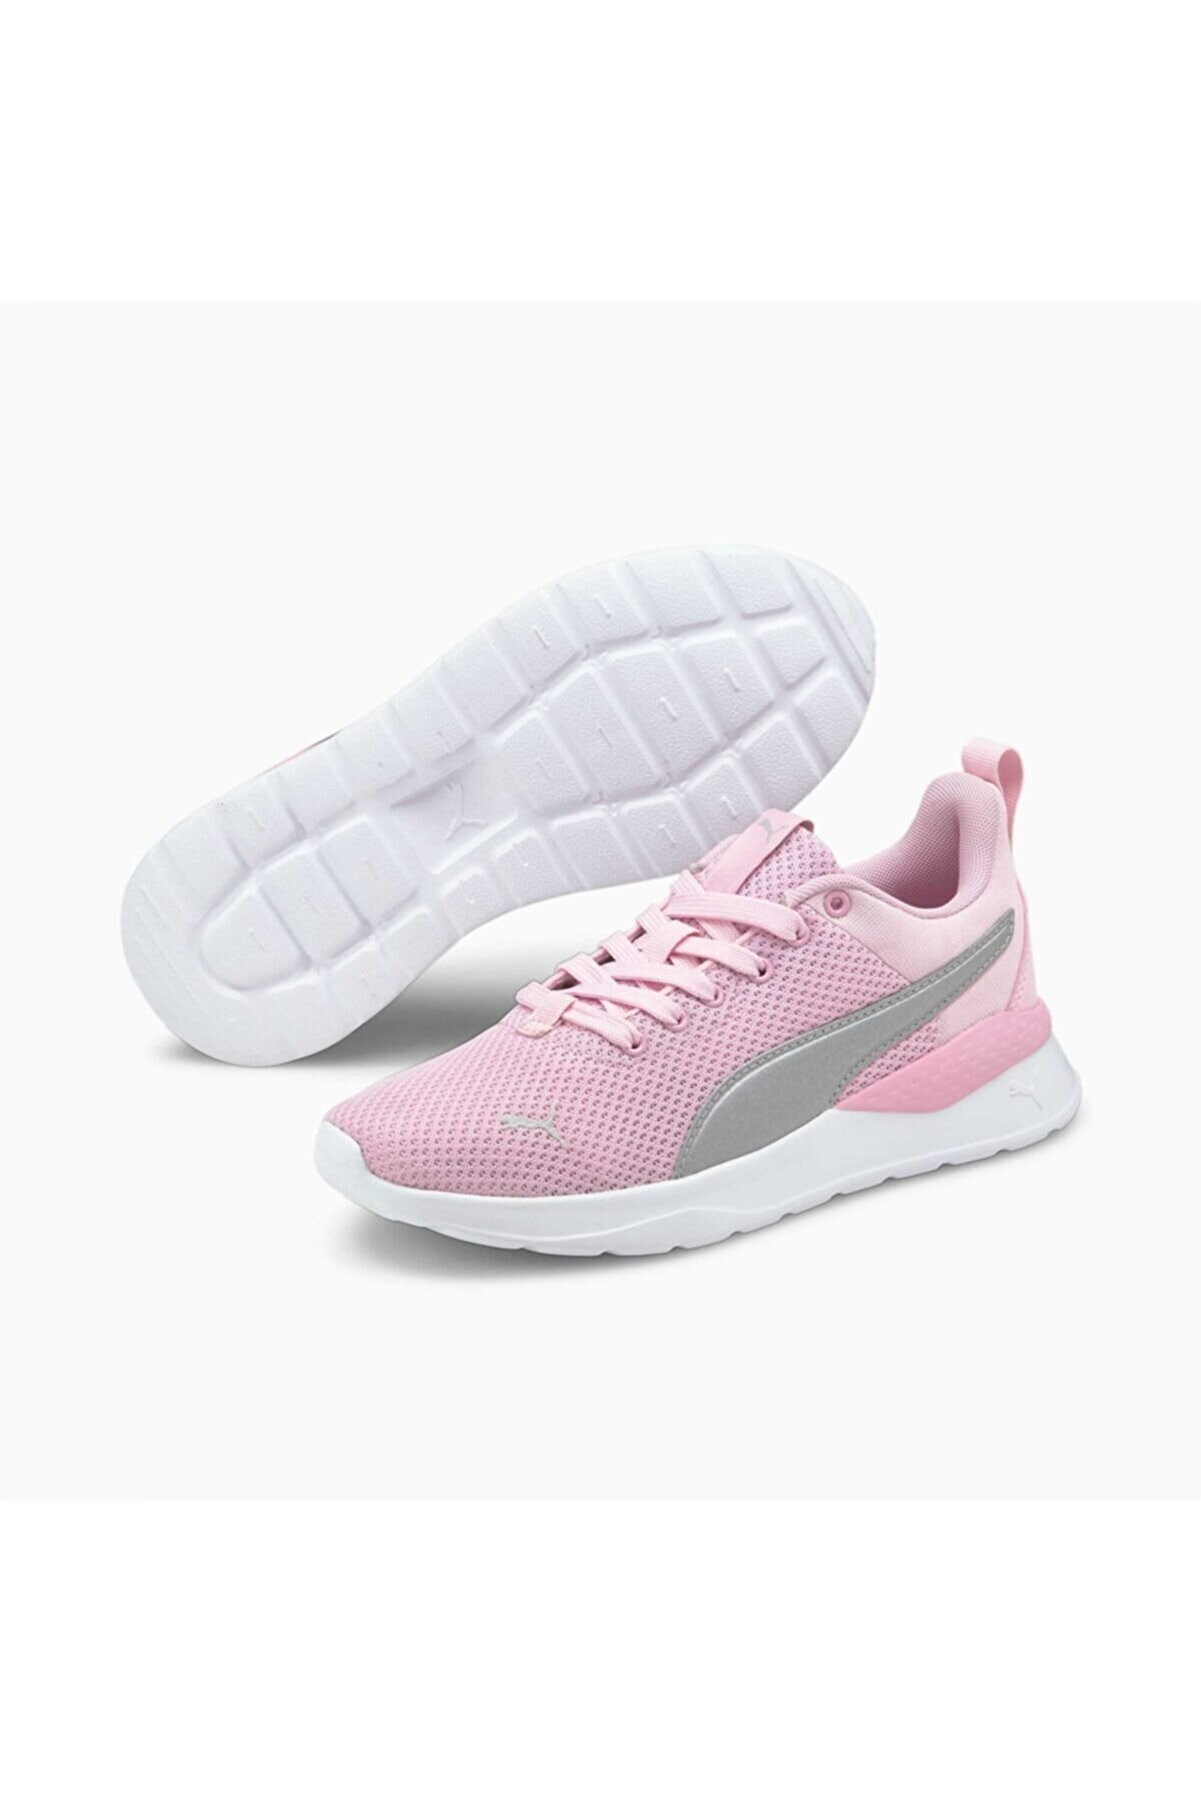 Puma 37200413 Anzarun Lite Jr Çocuk Günlük Spor Shoes